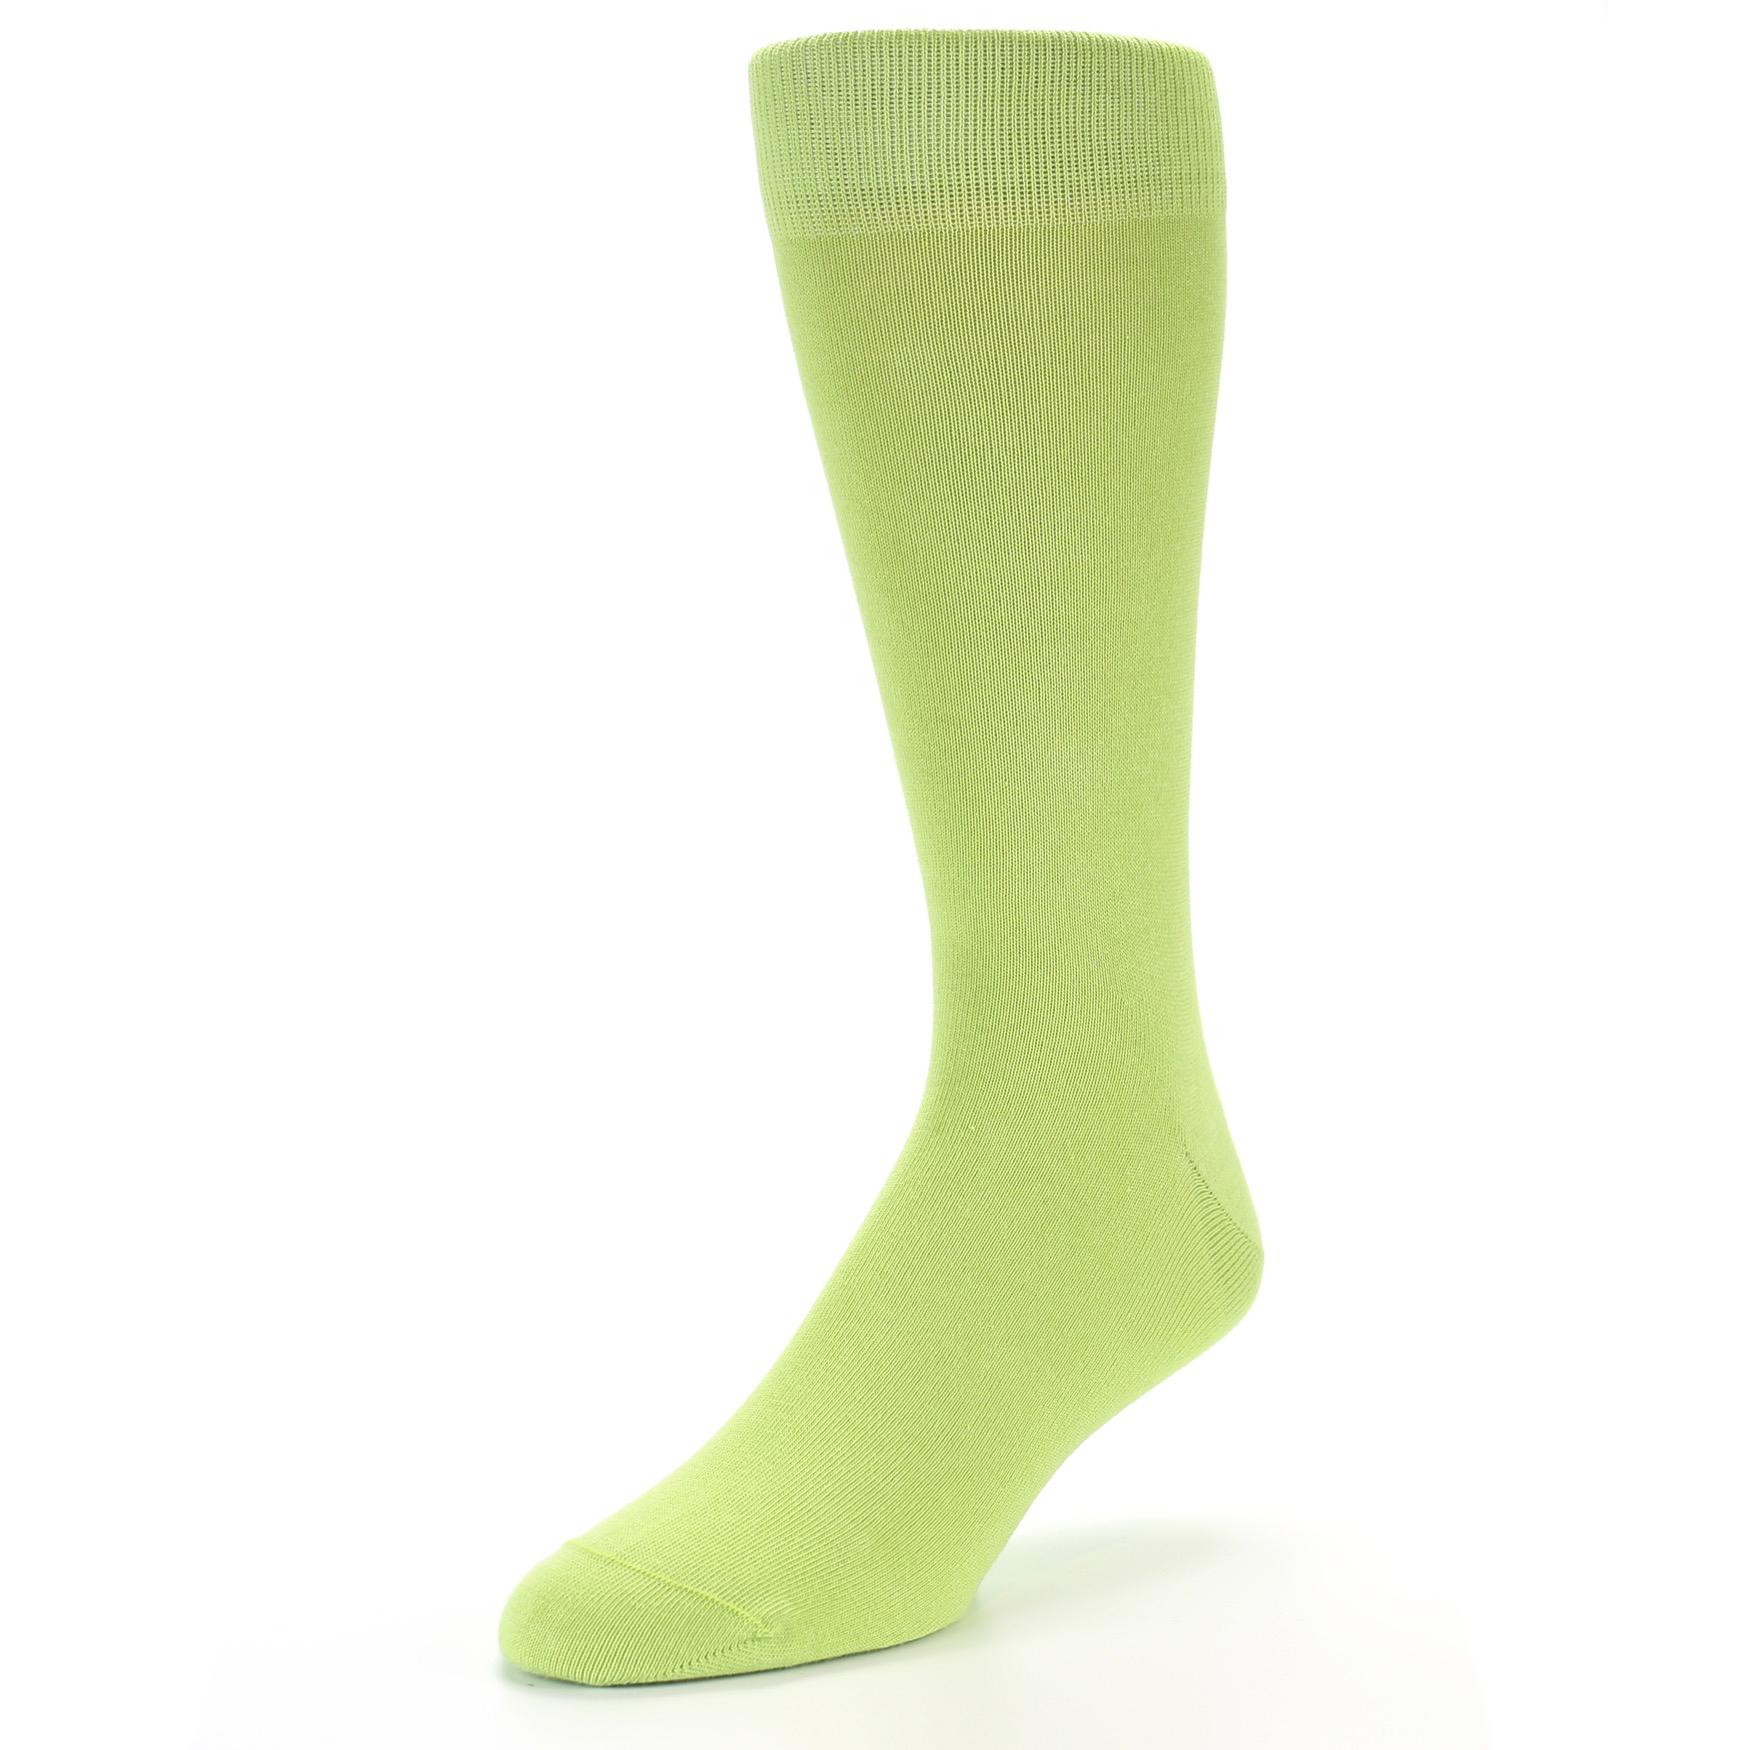 Lime Green Solid Color Socks Men S Dress Socks Boldsocks